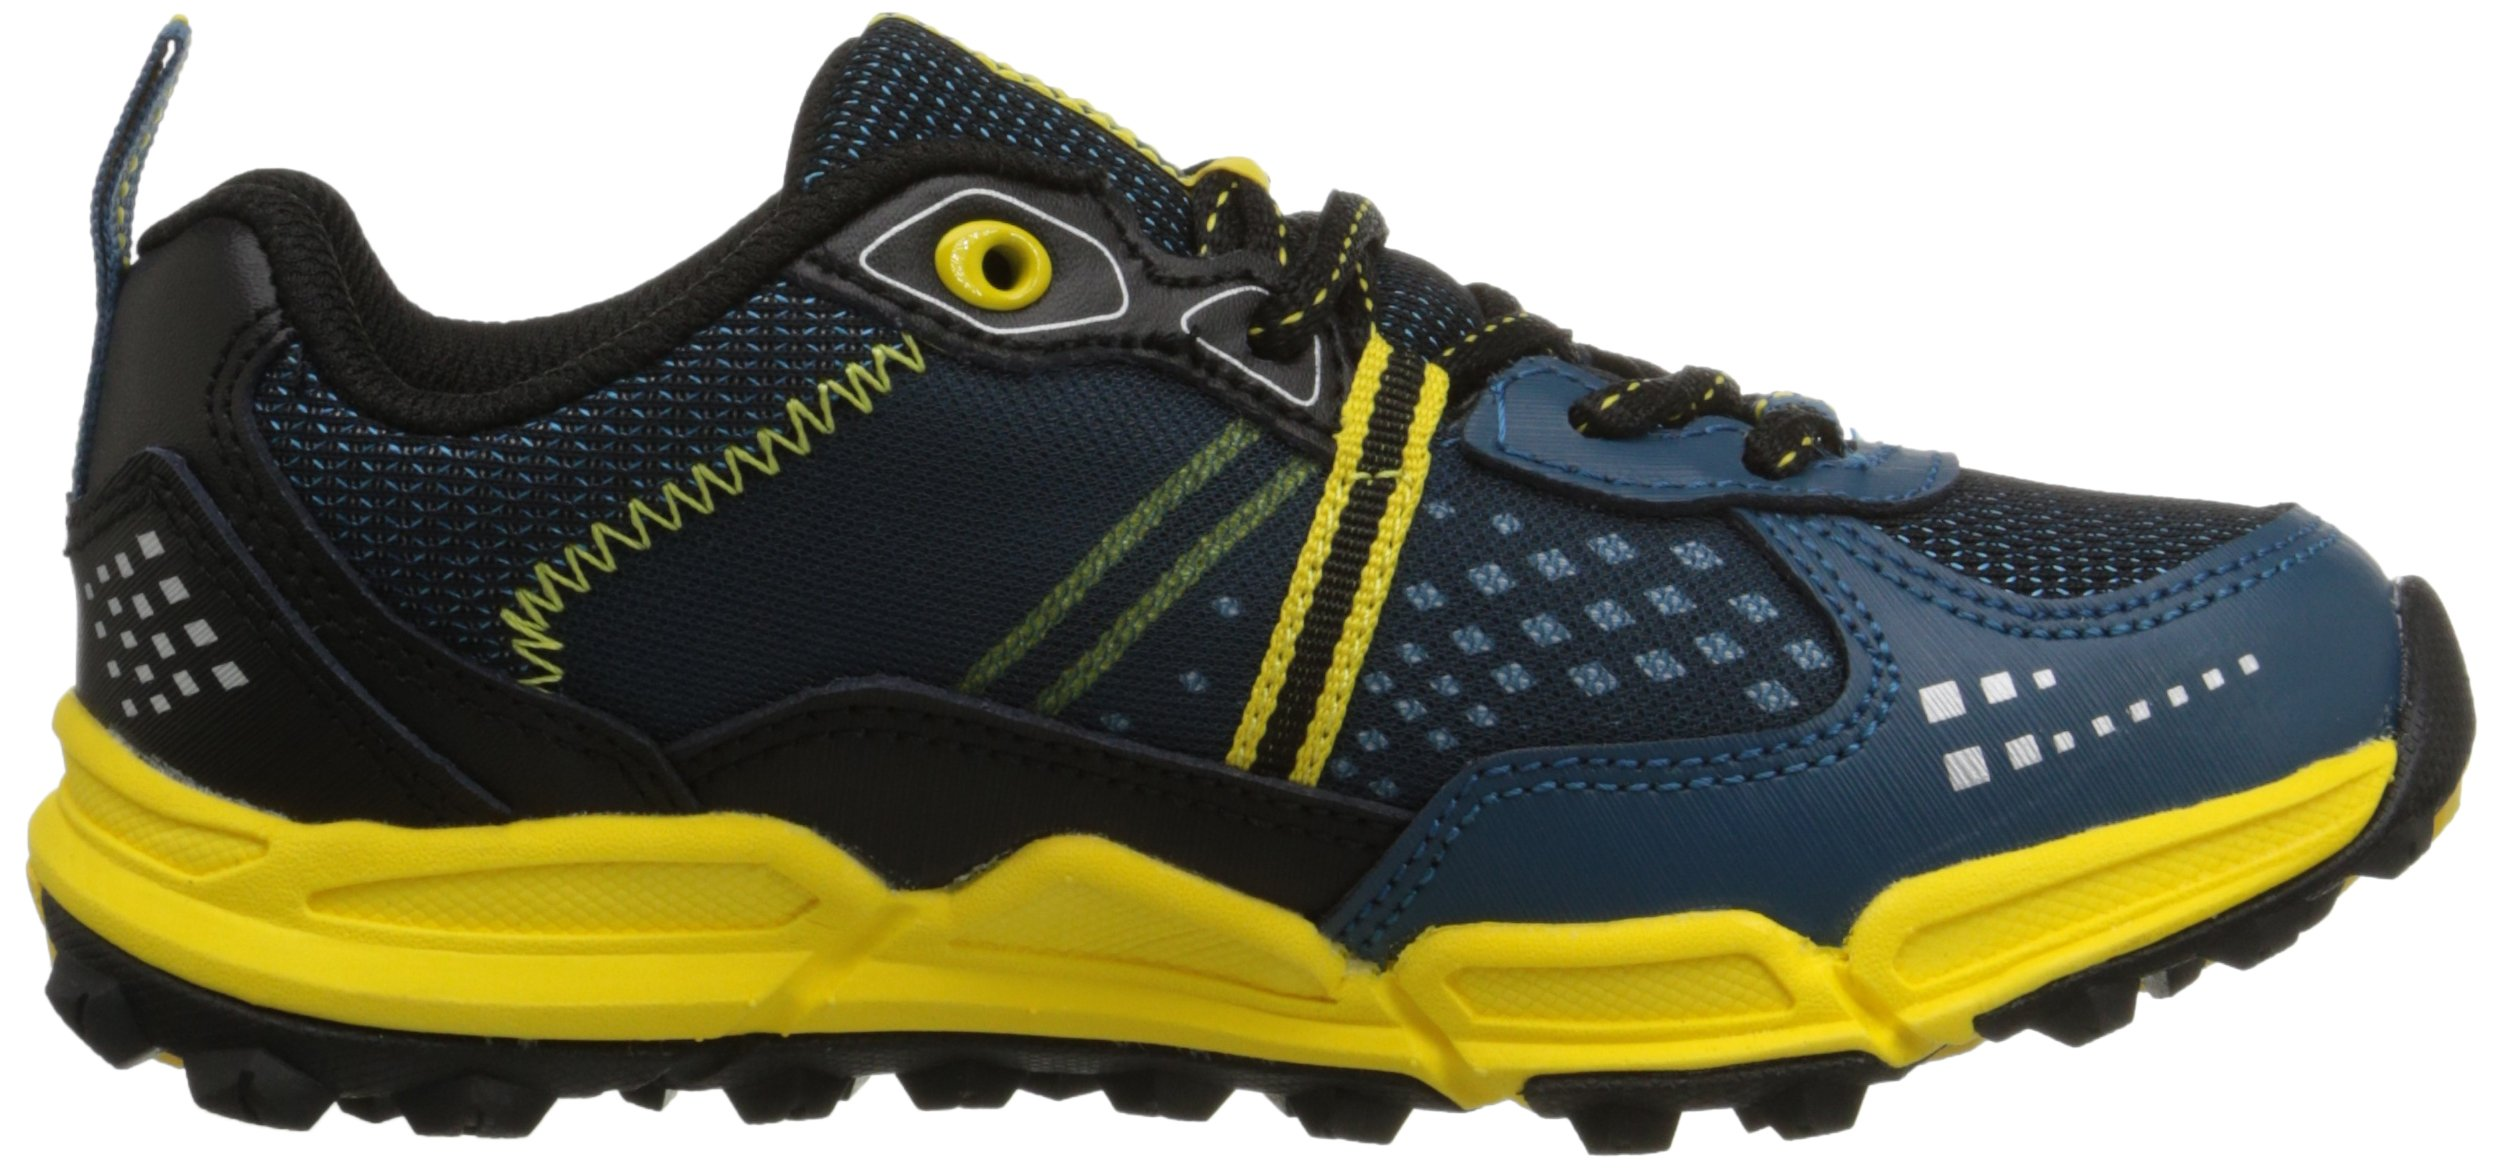 Teva Escapade Lo Athletic Trail Shoe (Little Kid/Big Kid), Blue/Yellow, 11 M US Little Kid by Teva (Image #7)